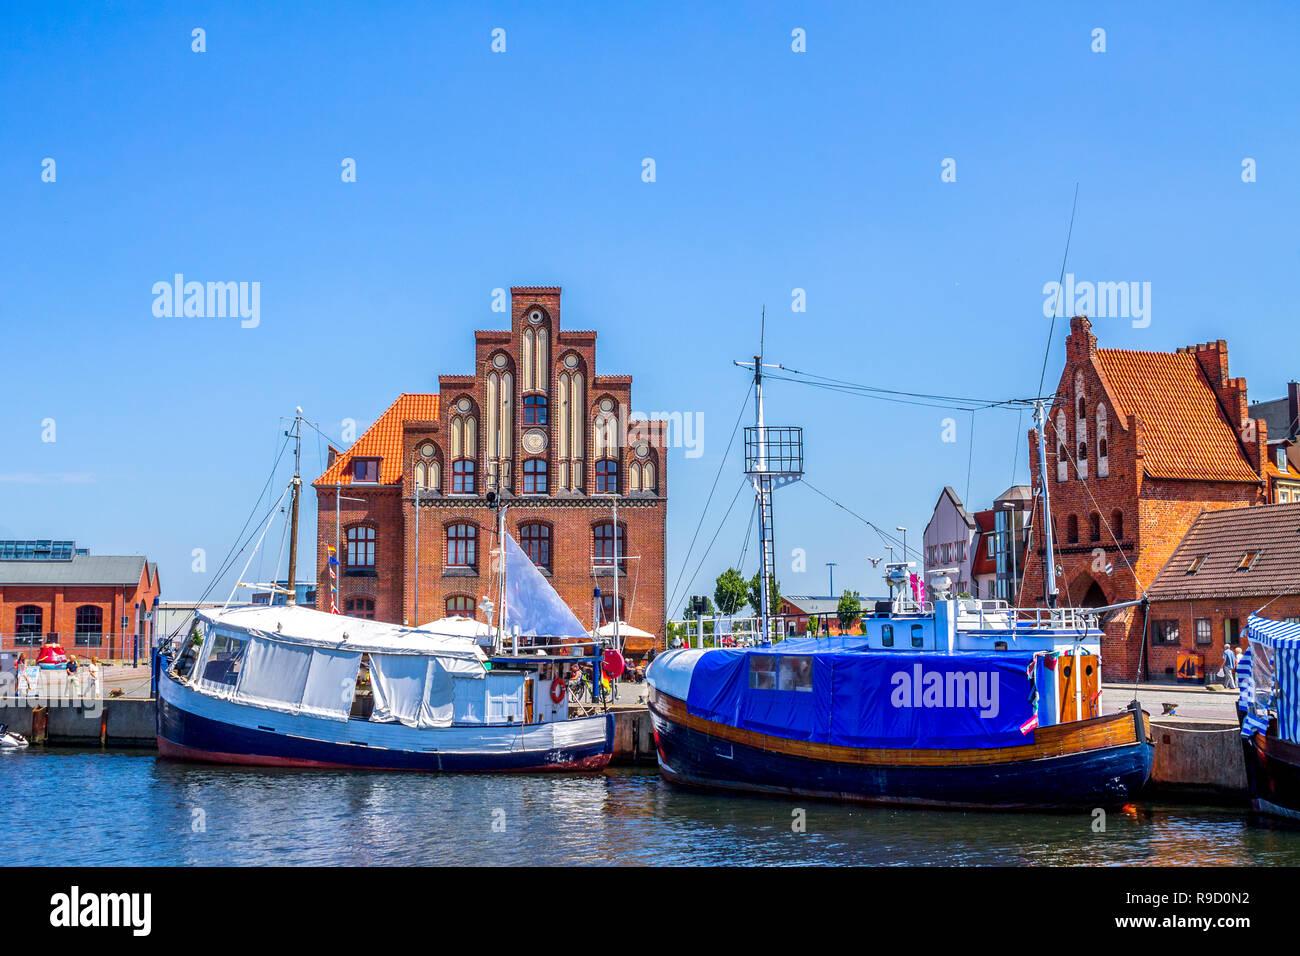 Marina, Wismar, Germany - Stock Image